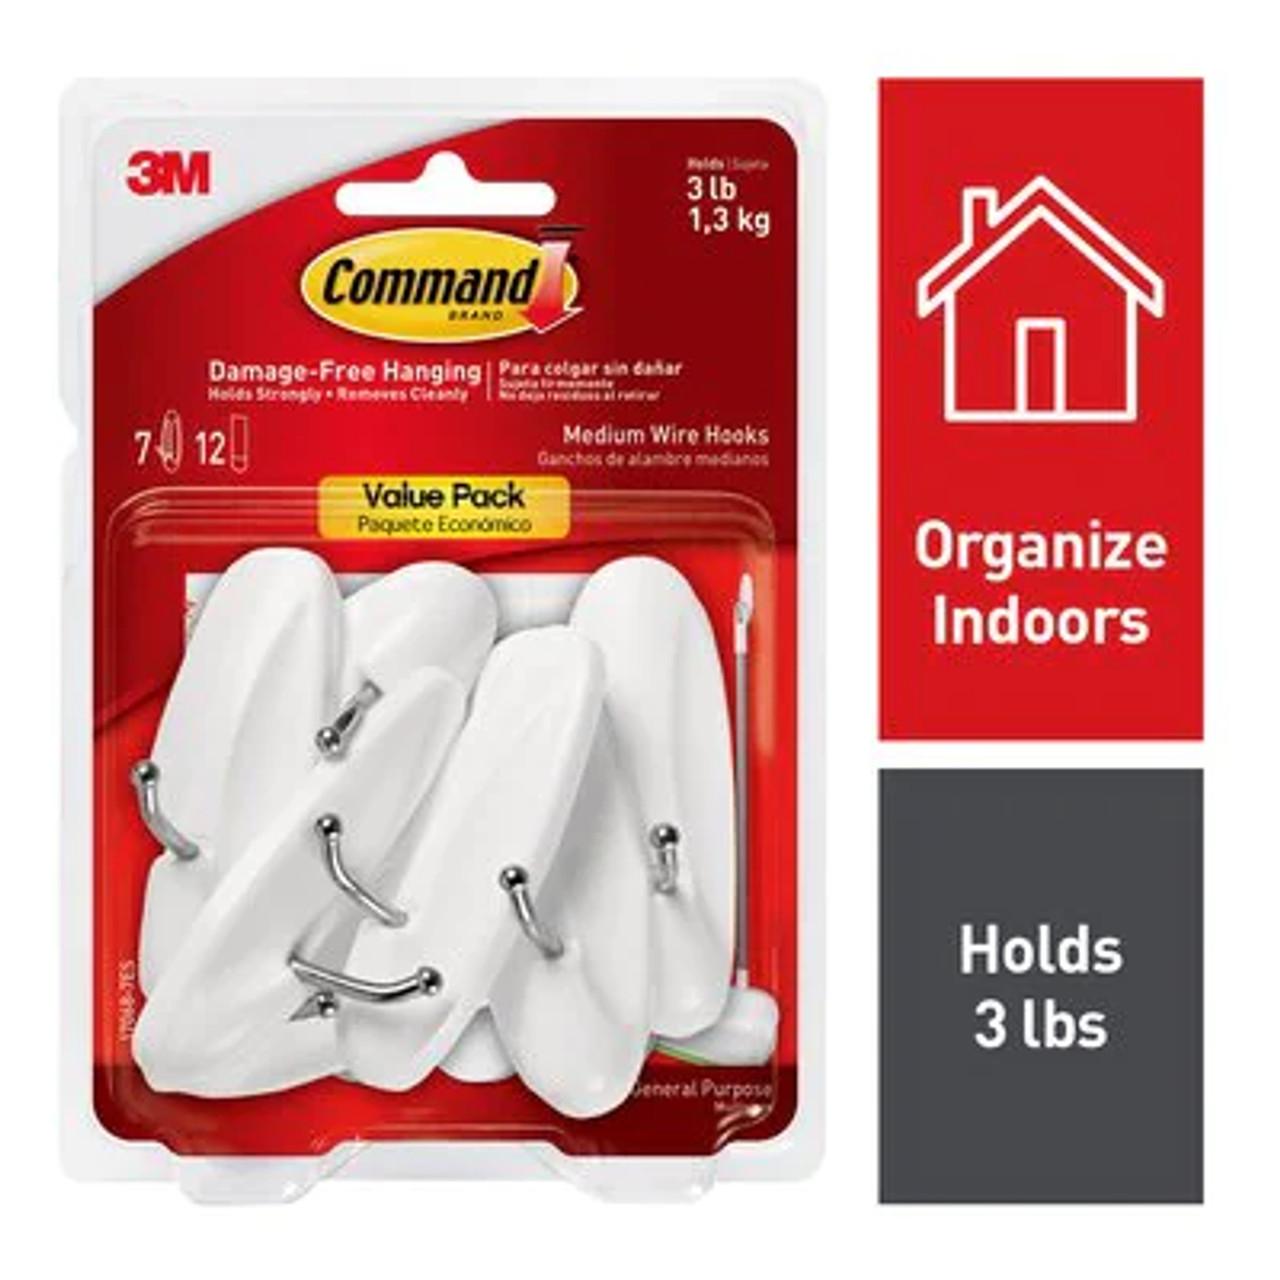 Command™ Medium Wire Hooks, Value Pack 7 hooks, 12 strips, 17068-7ES